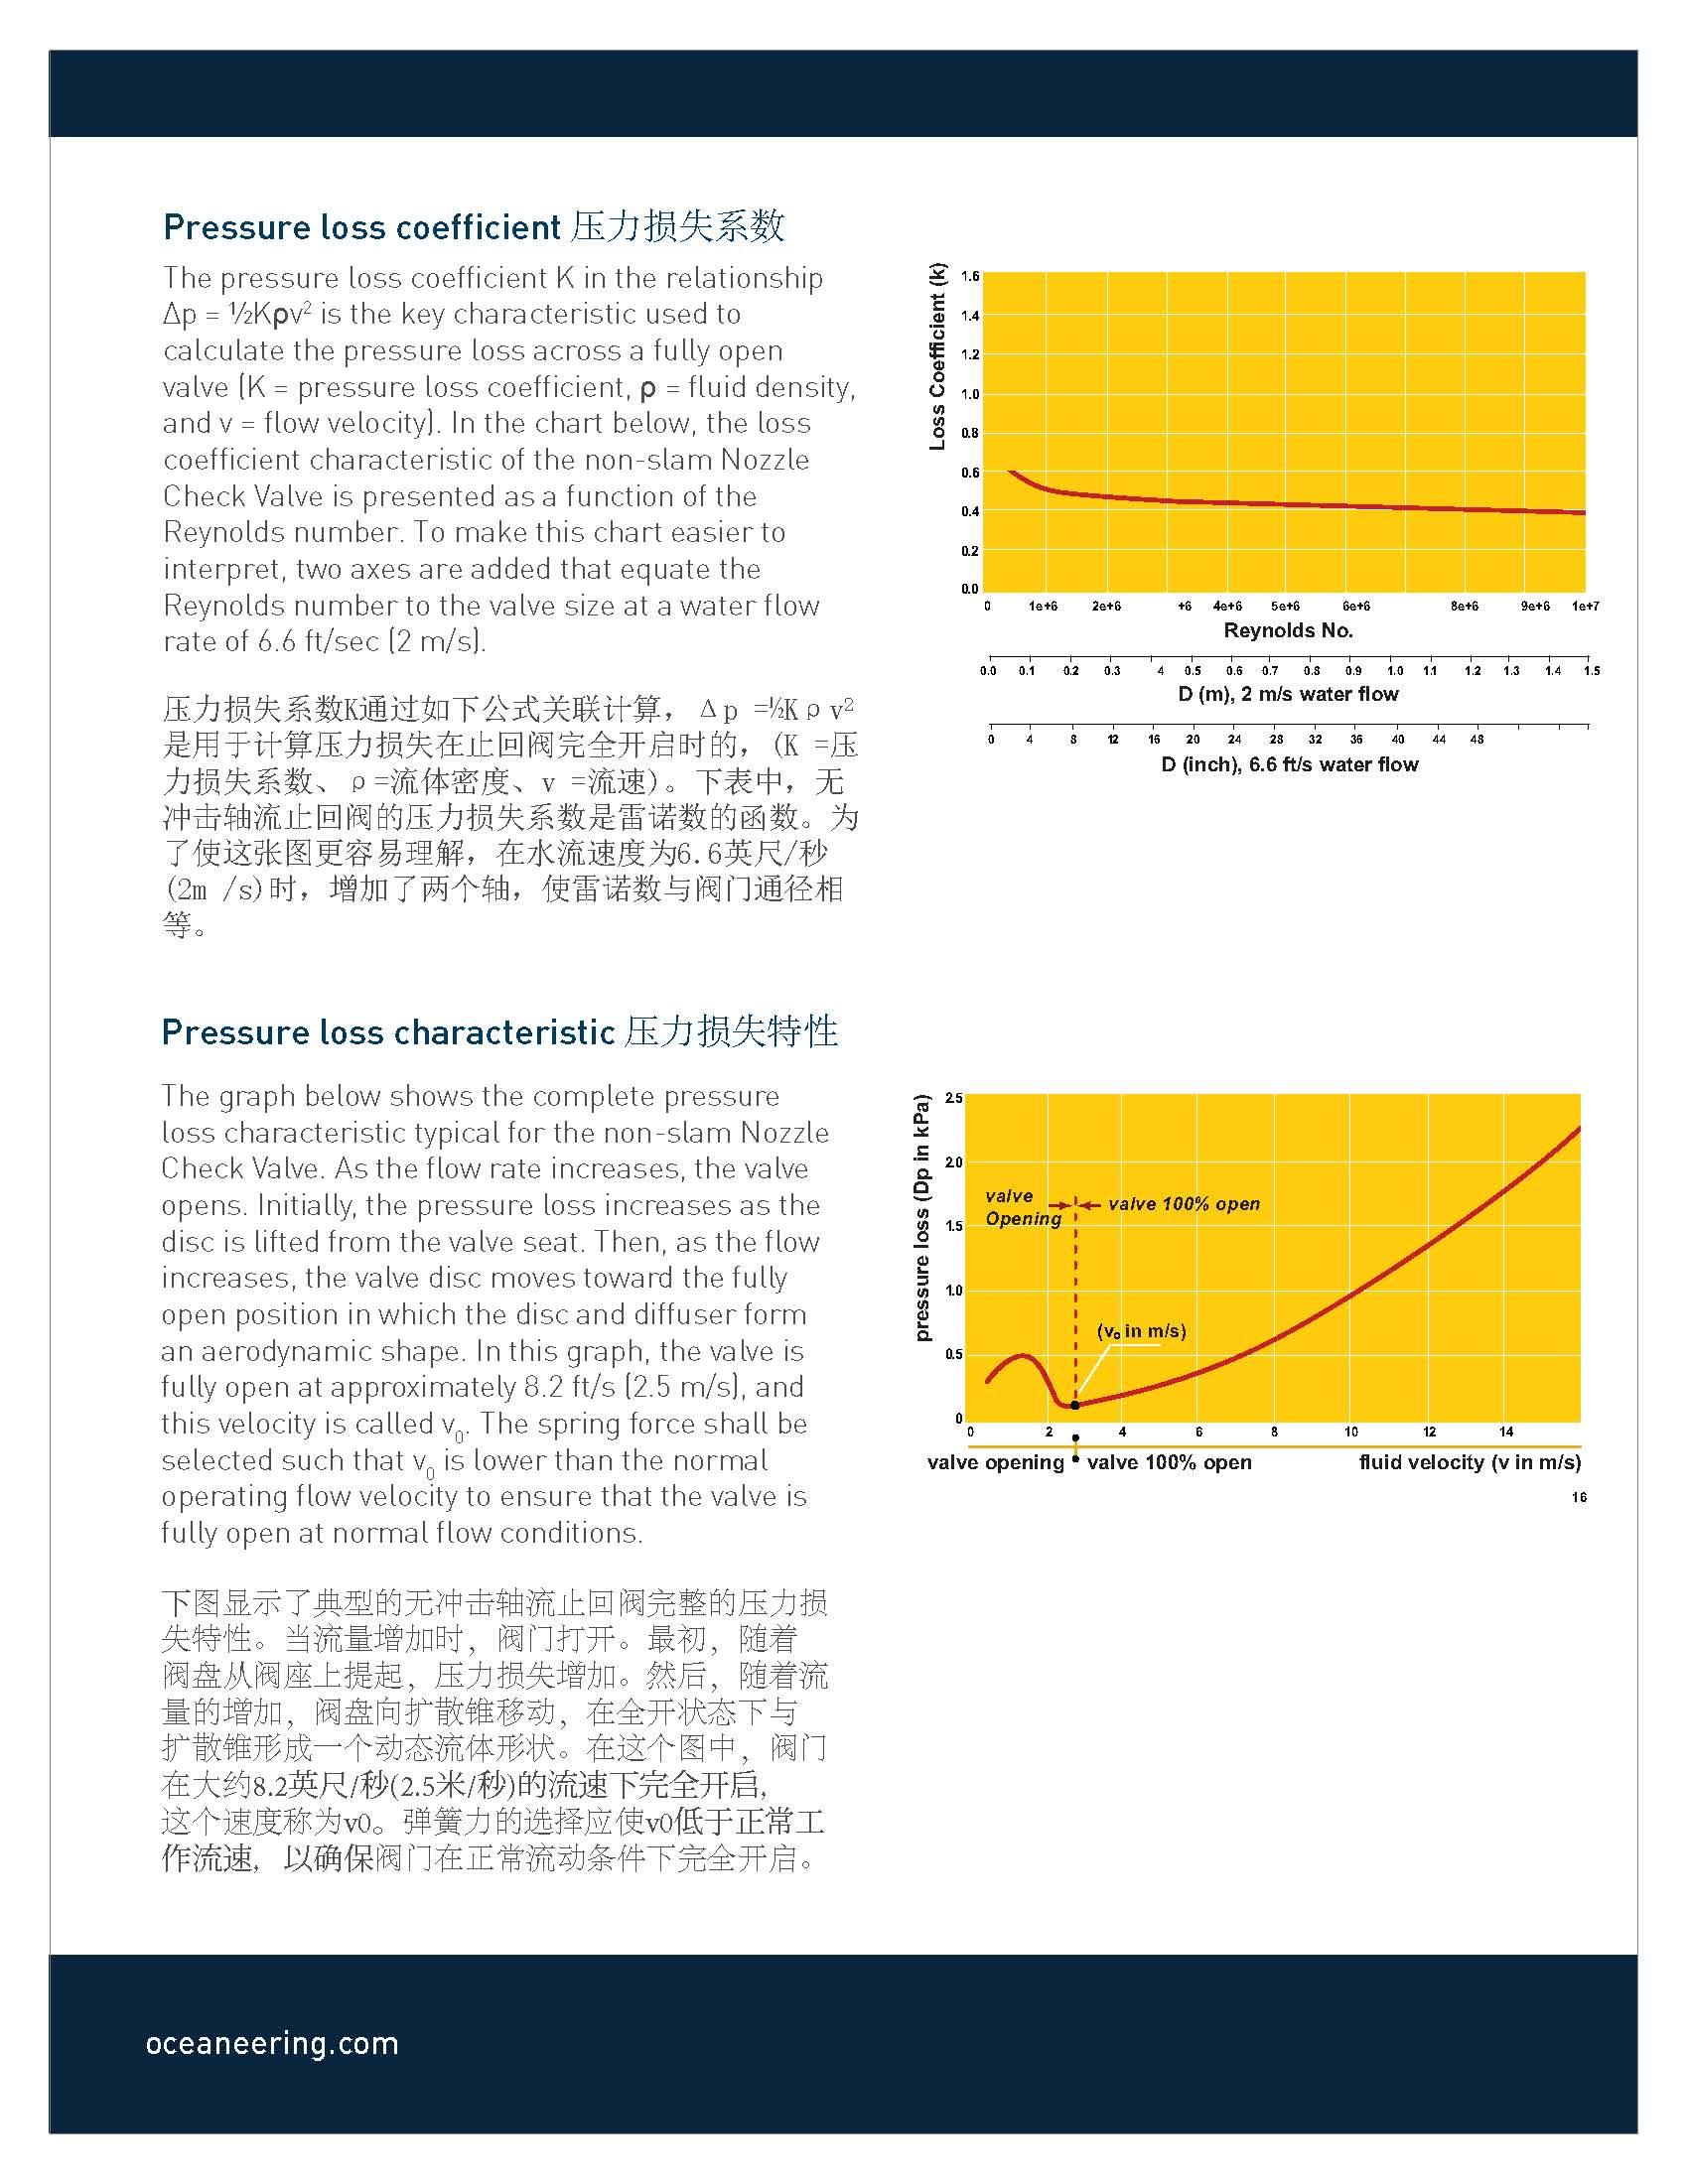 12Catalog-GraylocNozzleCheckValve-Chinese_页面_08